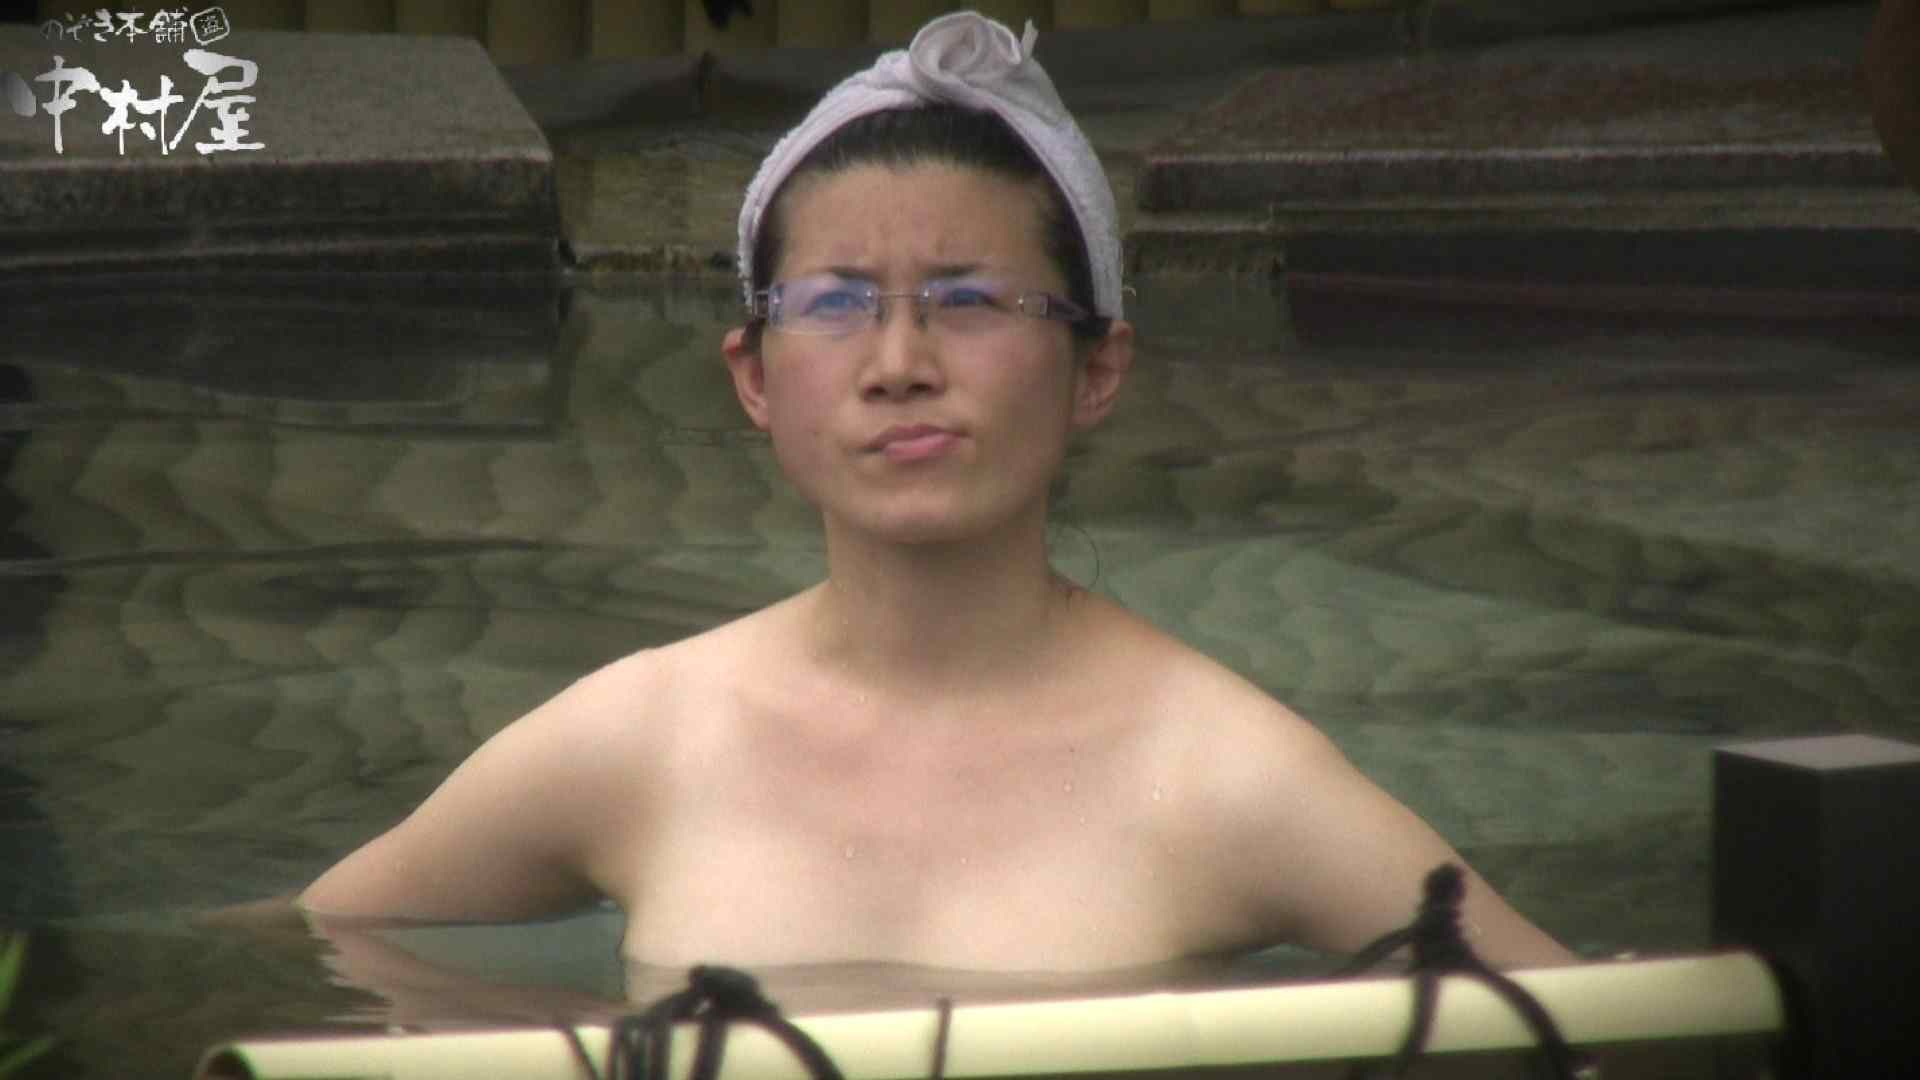 Aquaな露天風呂Vol.905 露天風呂   OLのエロ生活  99連発 31